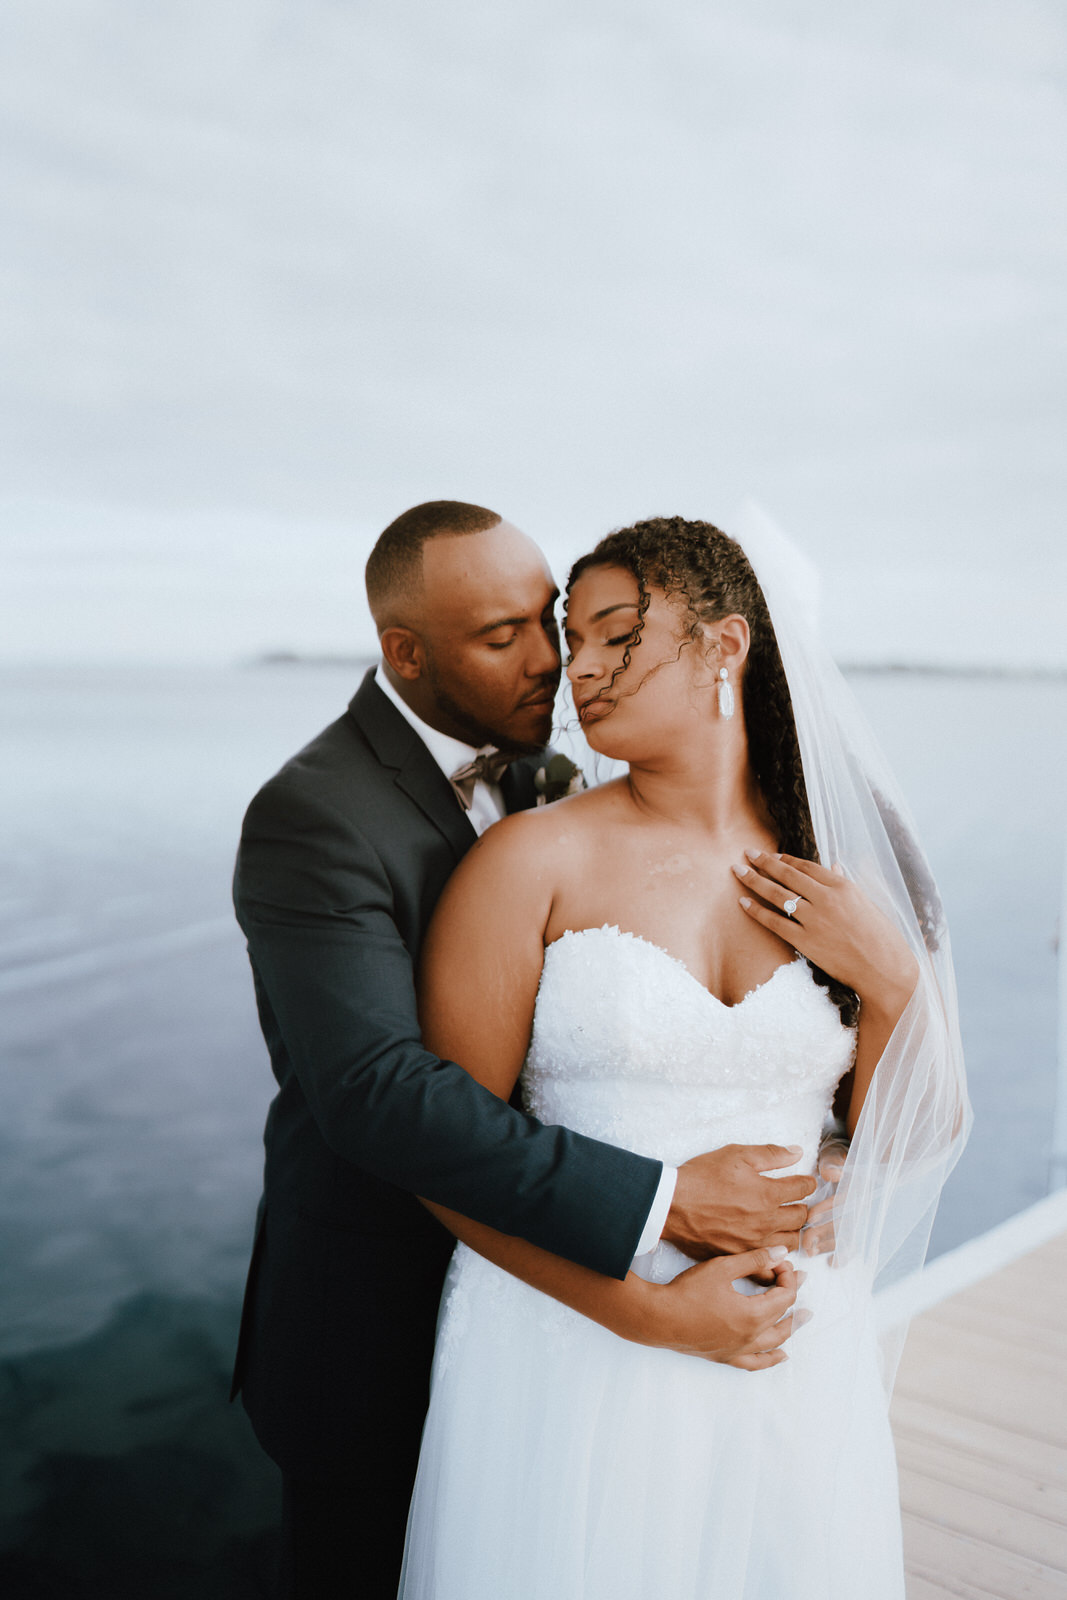 South Seas Island Resort Elopement- Alyana and Shawn- Michelle Gonzalez Photography-395.JPG